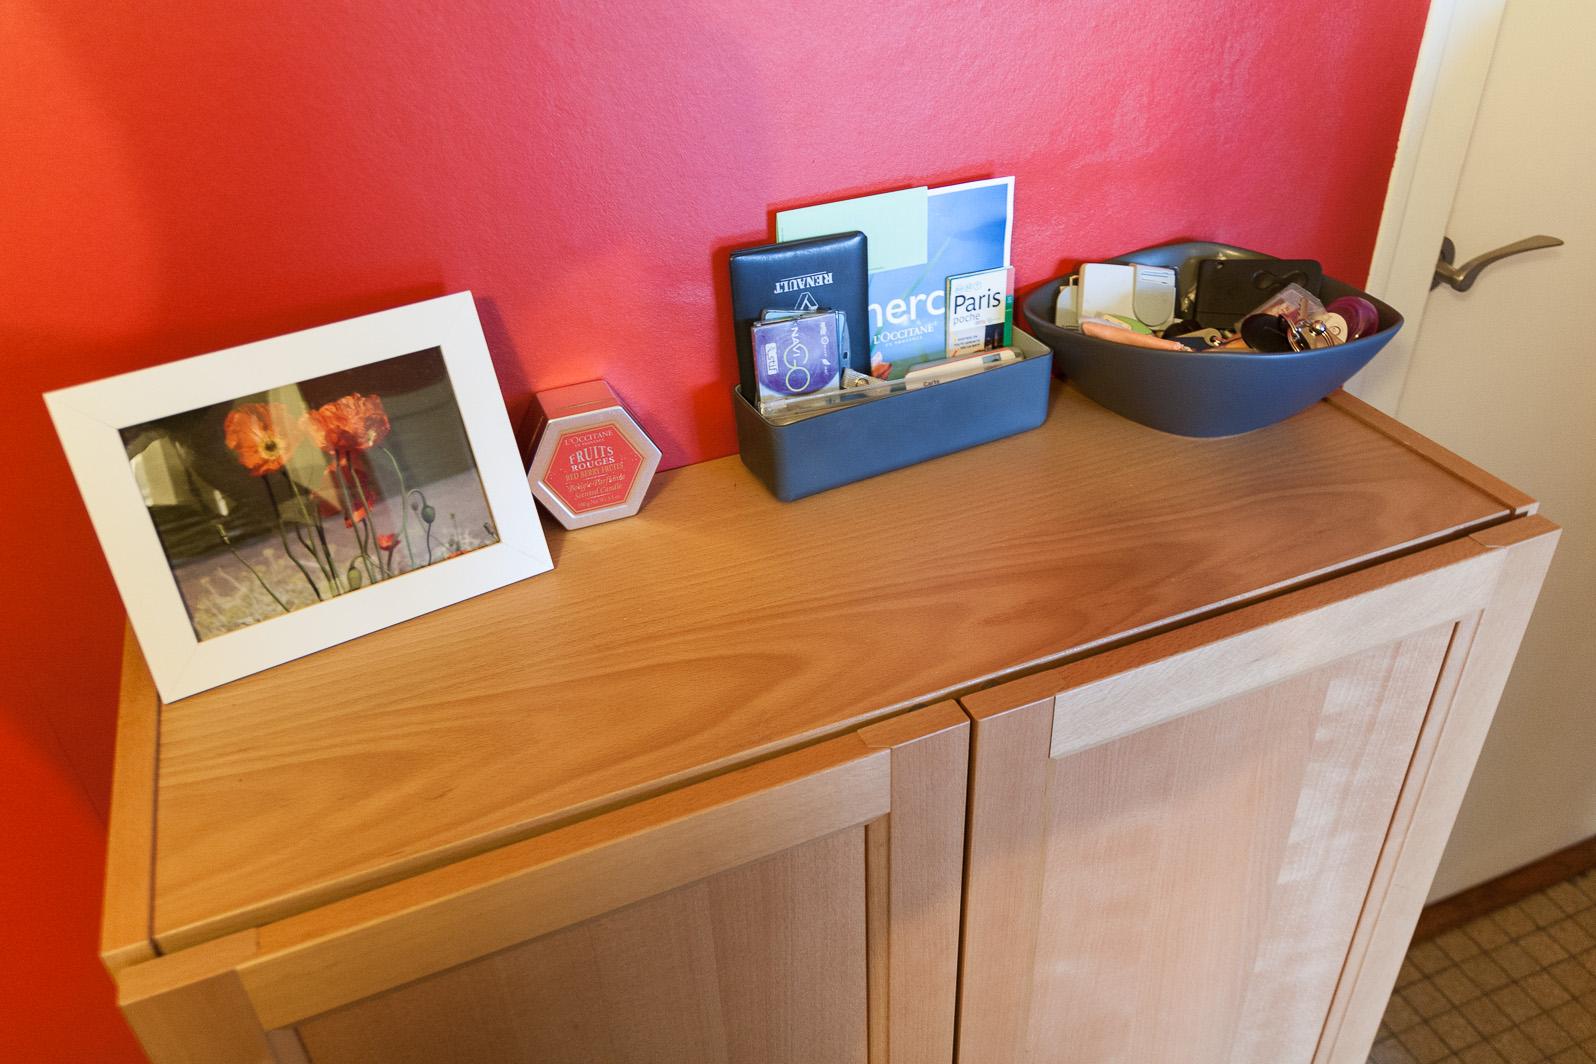 agencer et mijoter id e pratique le vide poche de l entr e. Black Bedroom Furniture Sets. Home Design Ideas